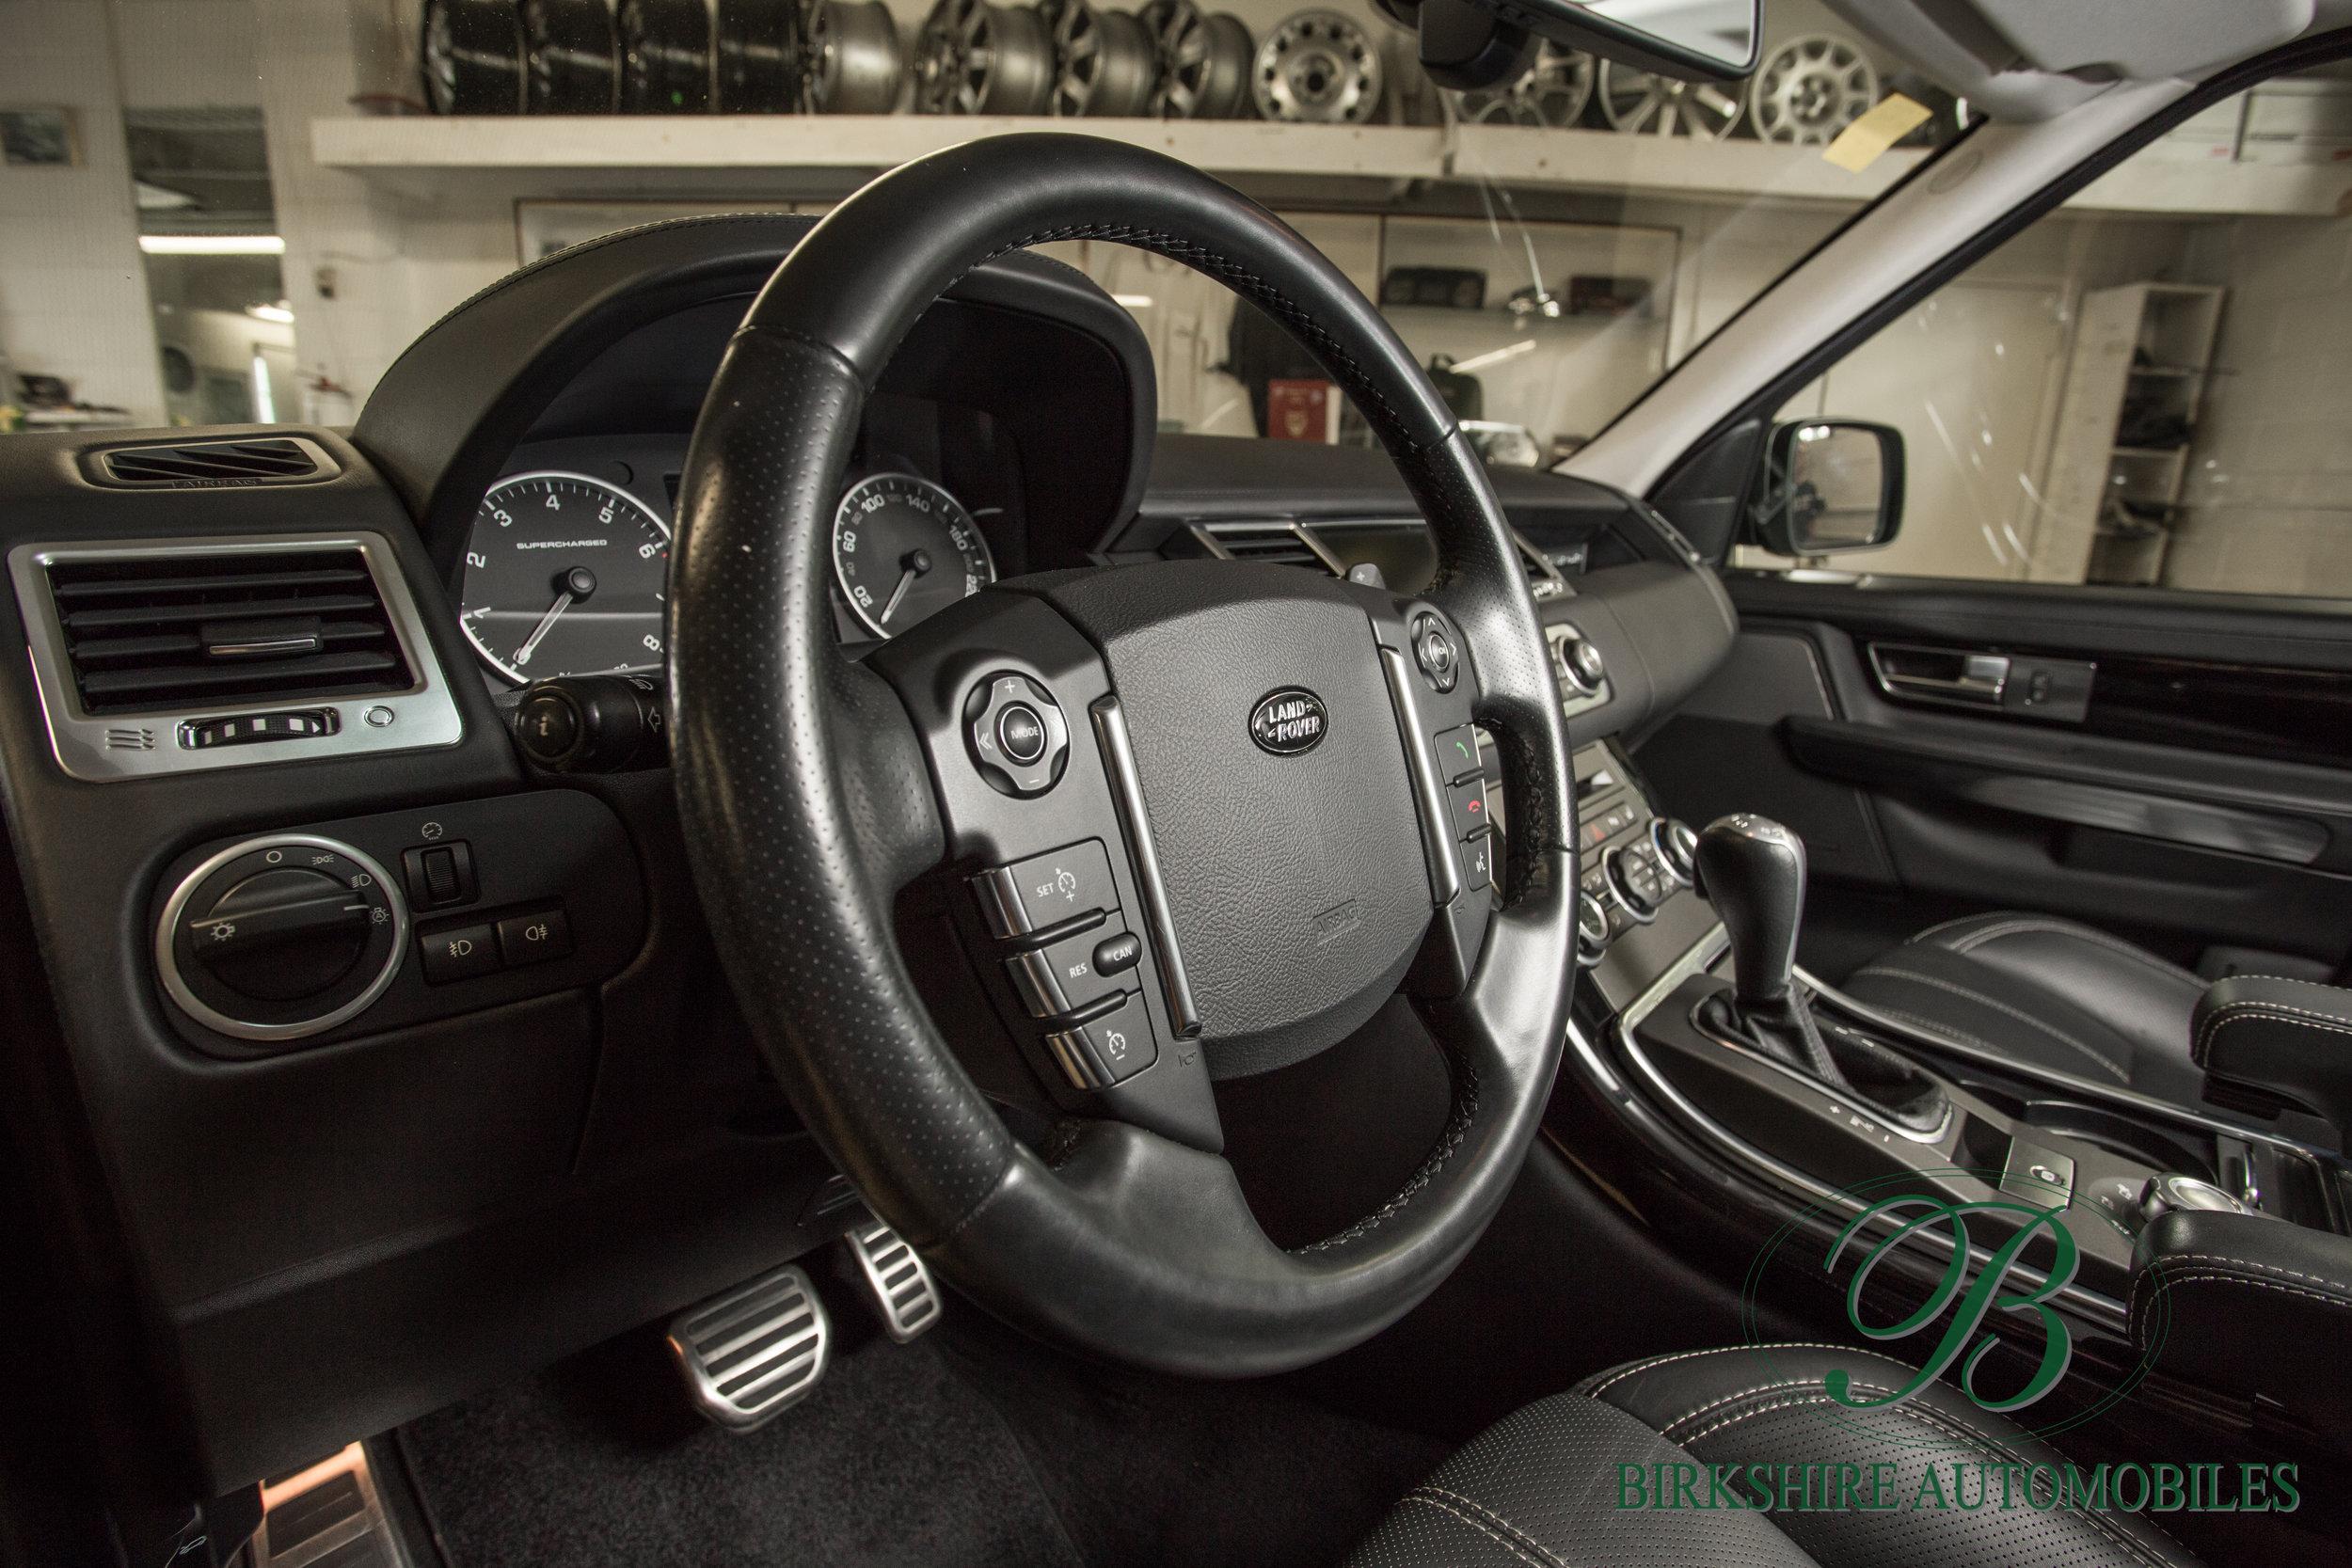 Birkshire Automobiles-19.jpg